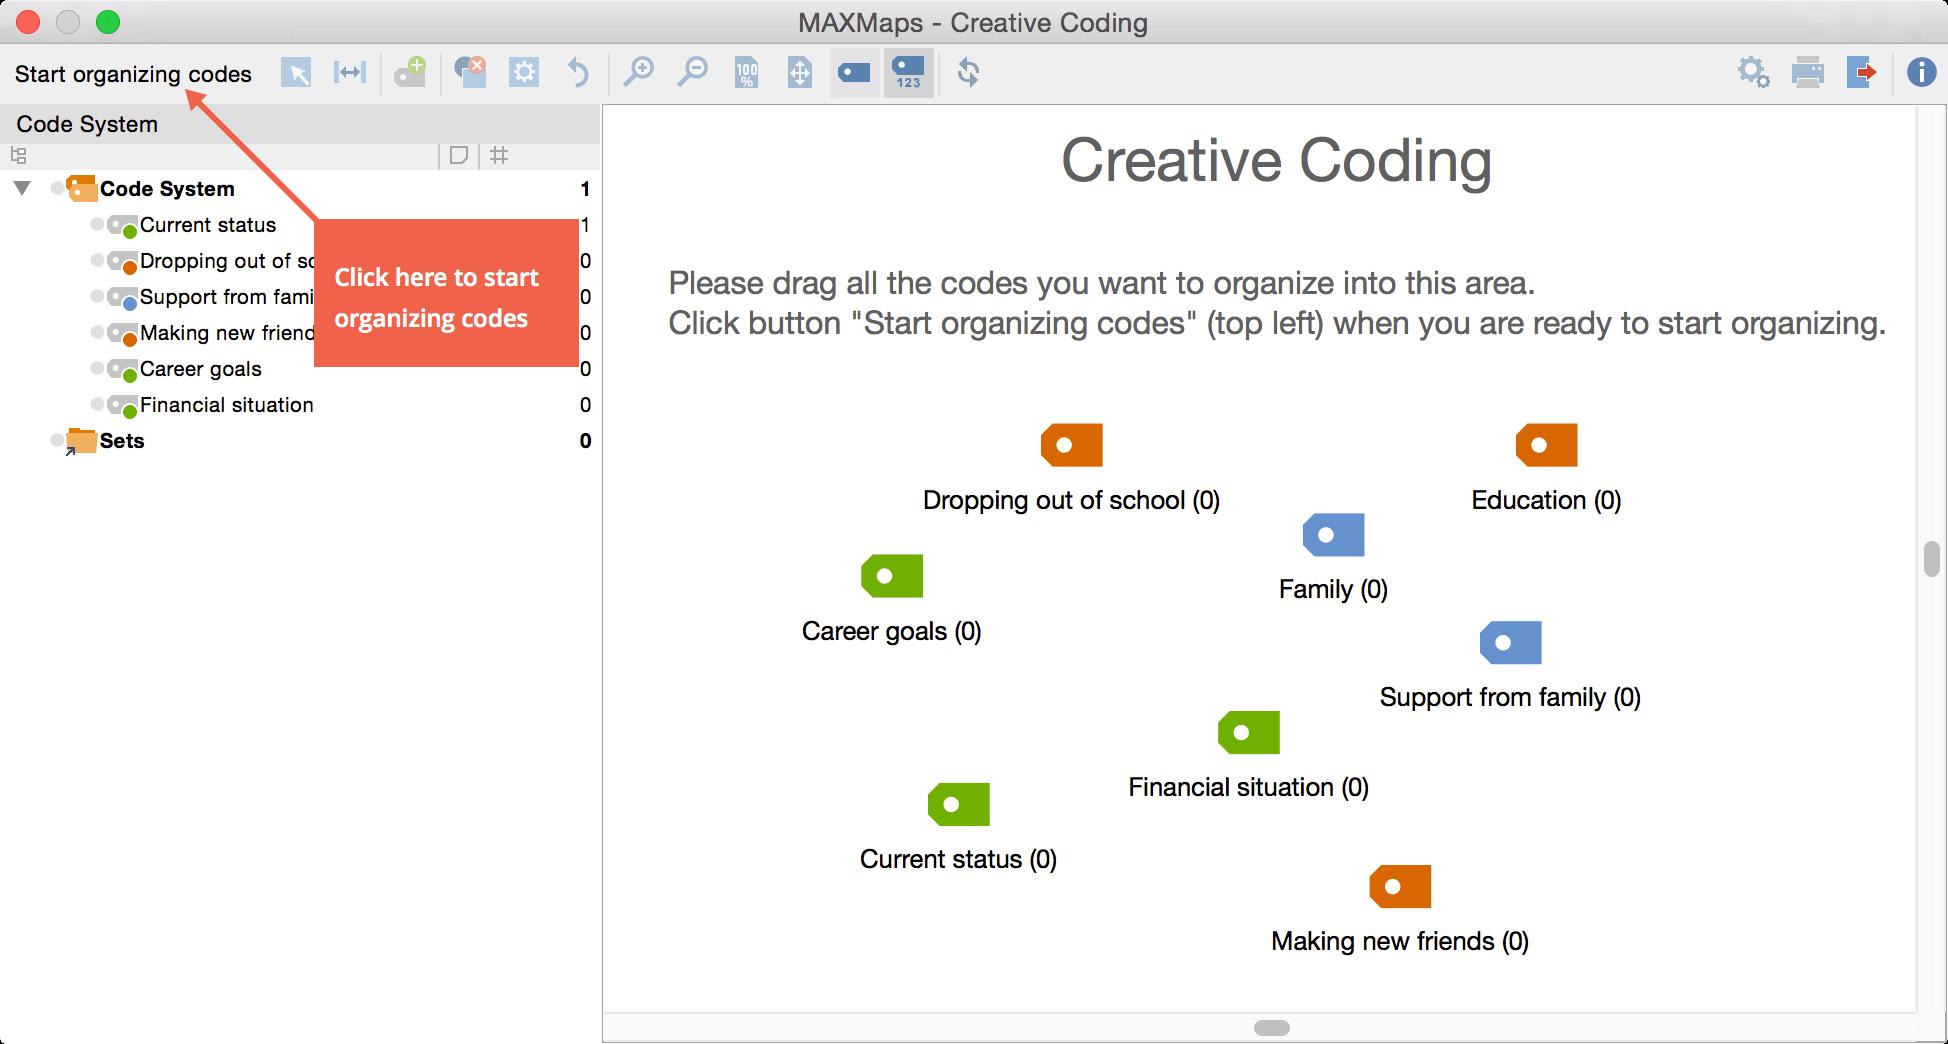 Creative-Coding-with-MAXQDA